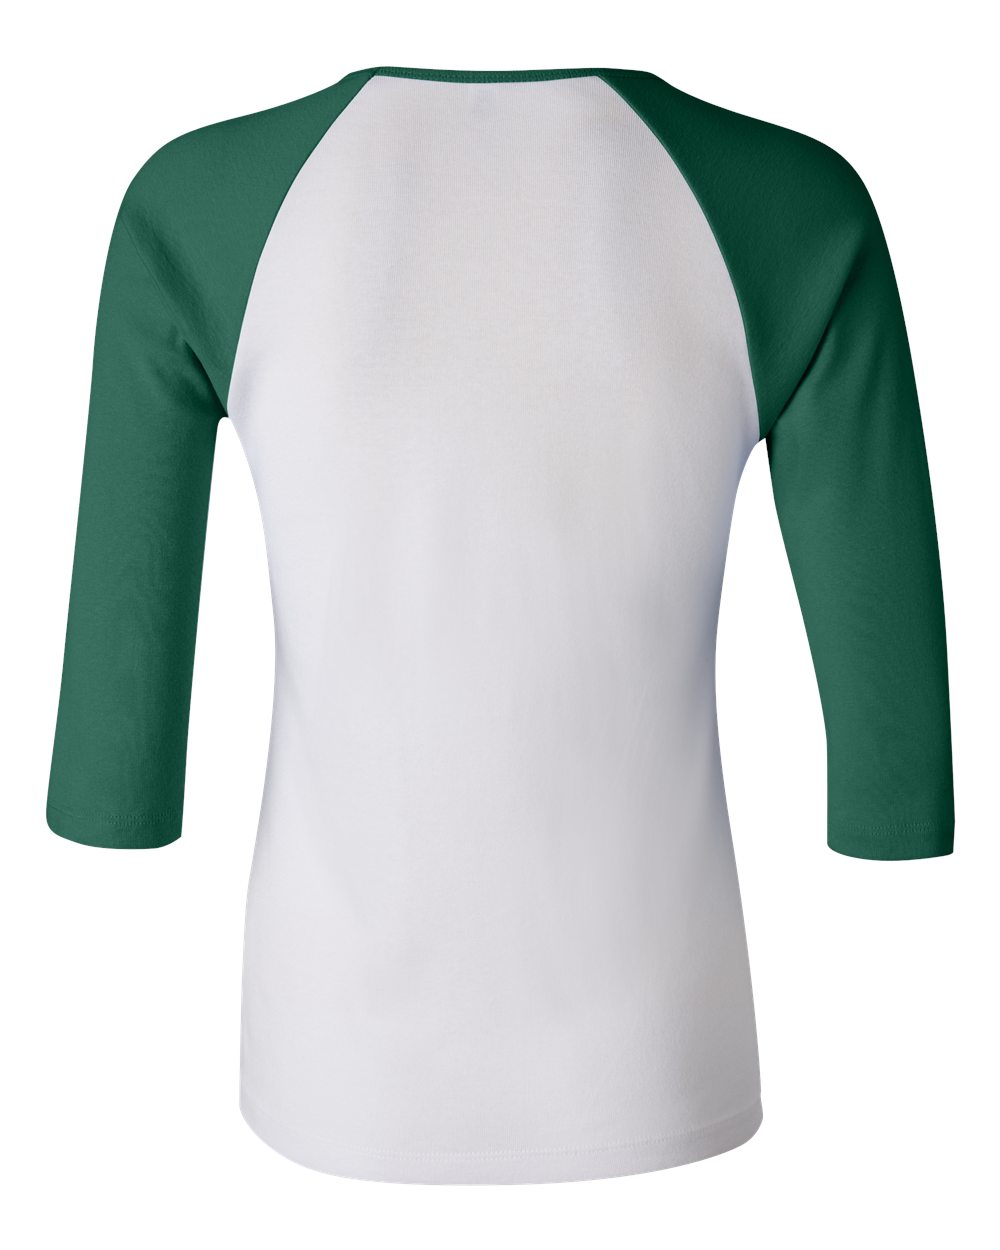 Bella-Canvas-Womens-Stretch-Rib-3-4-Sleeve-Contrast-Raglan-T-Shirt-B2000 thumbnail 17